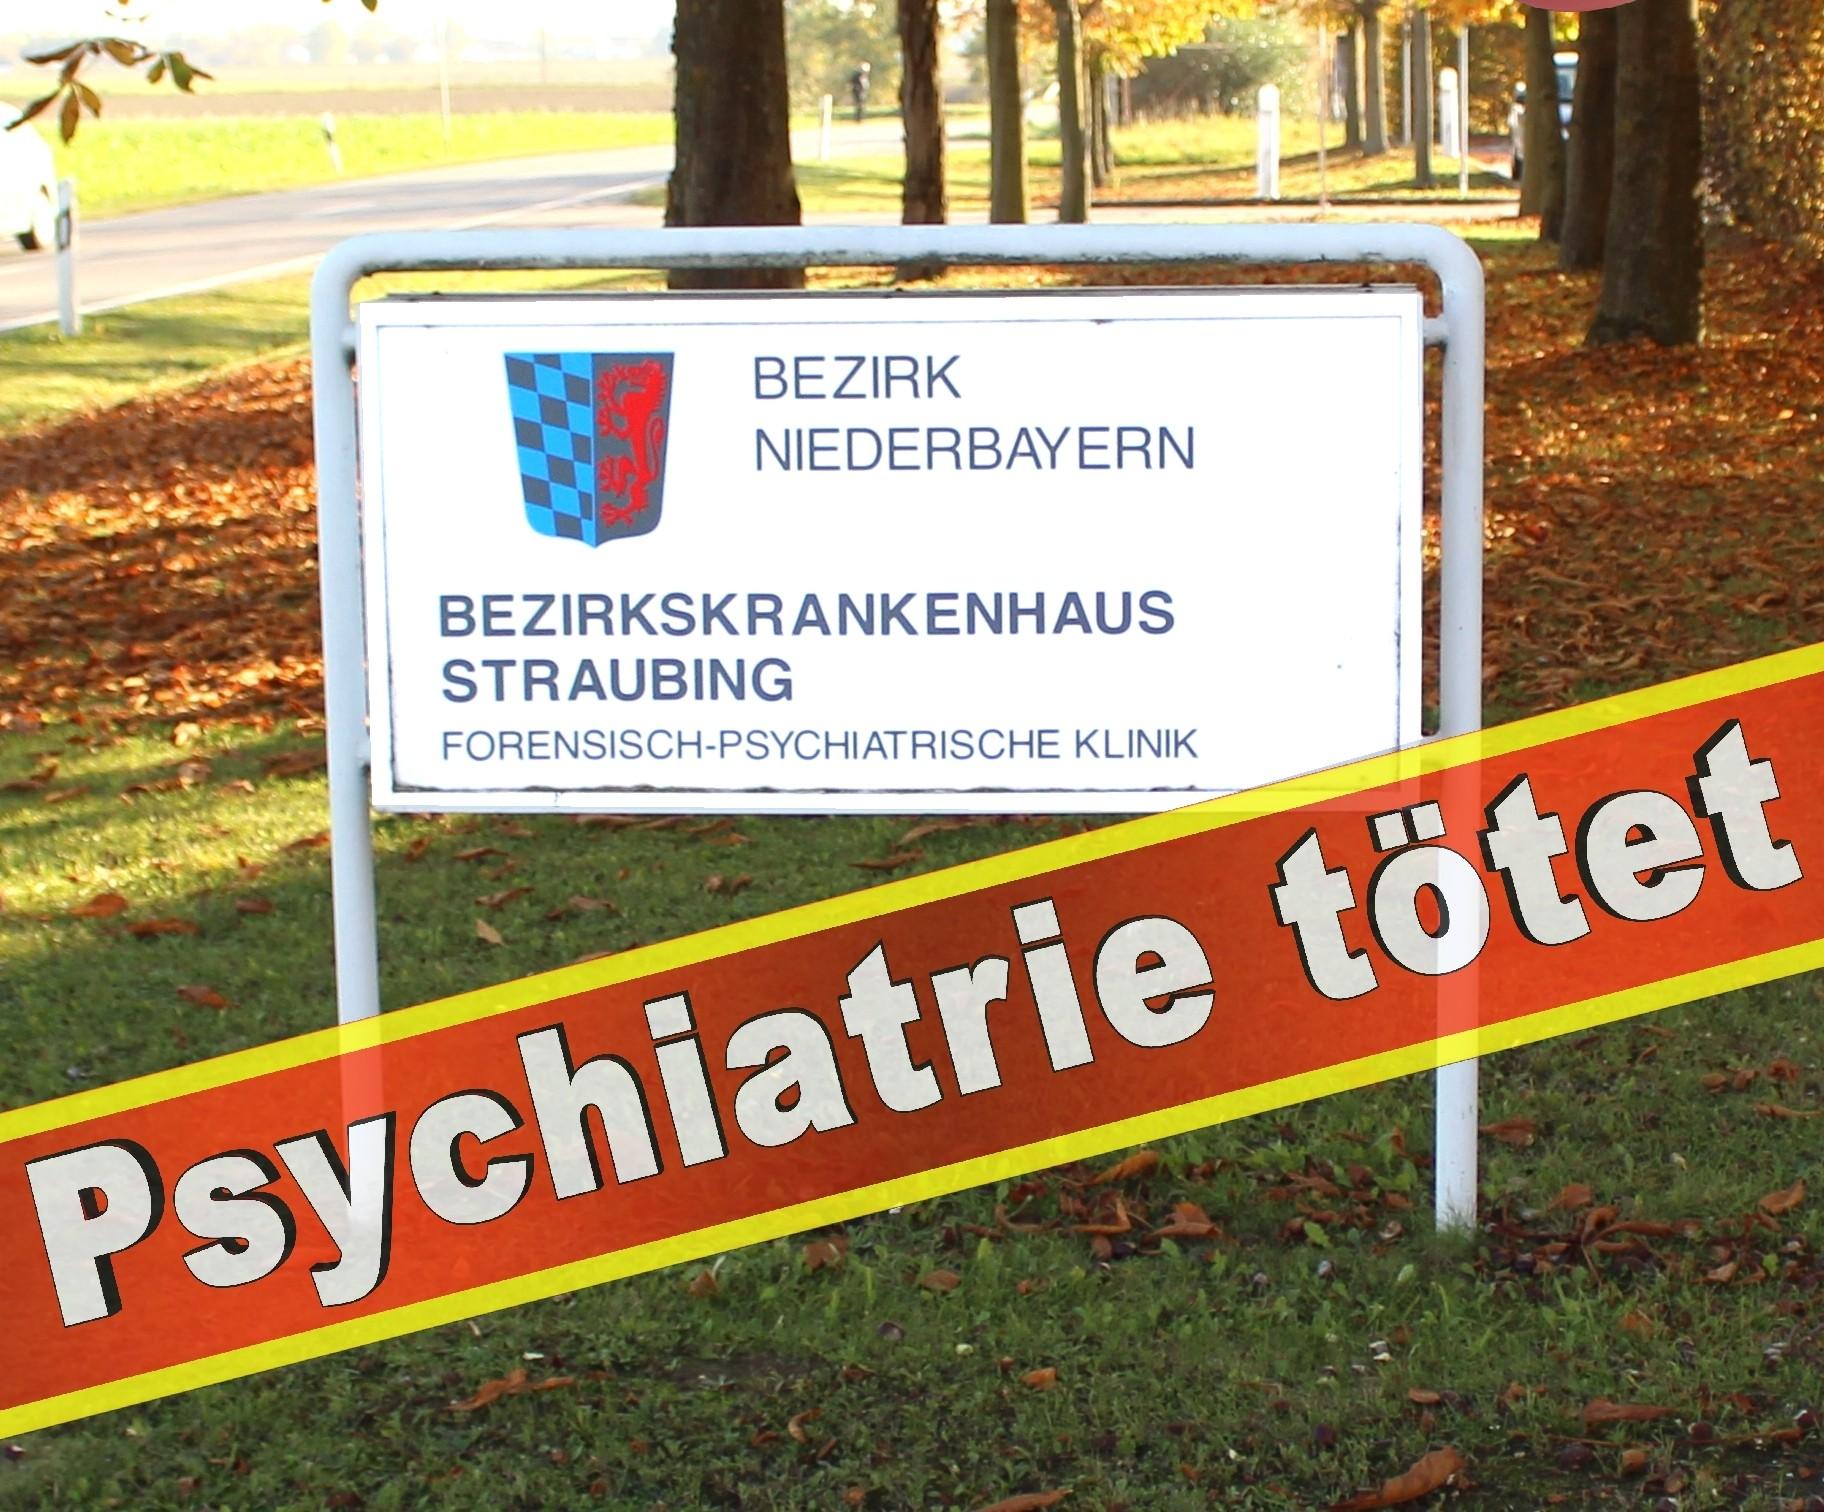 BKH Straubing Forensik Psychiatrie Forensische Klinik (4)